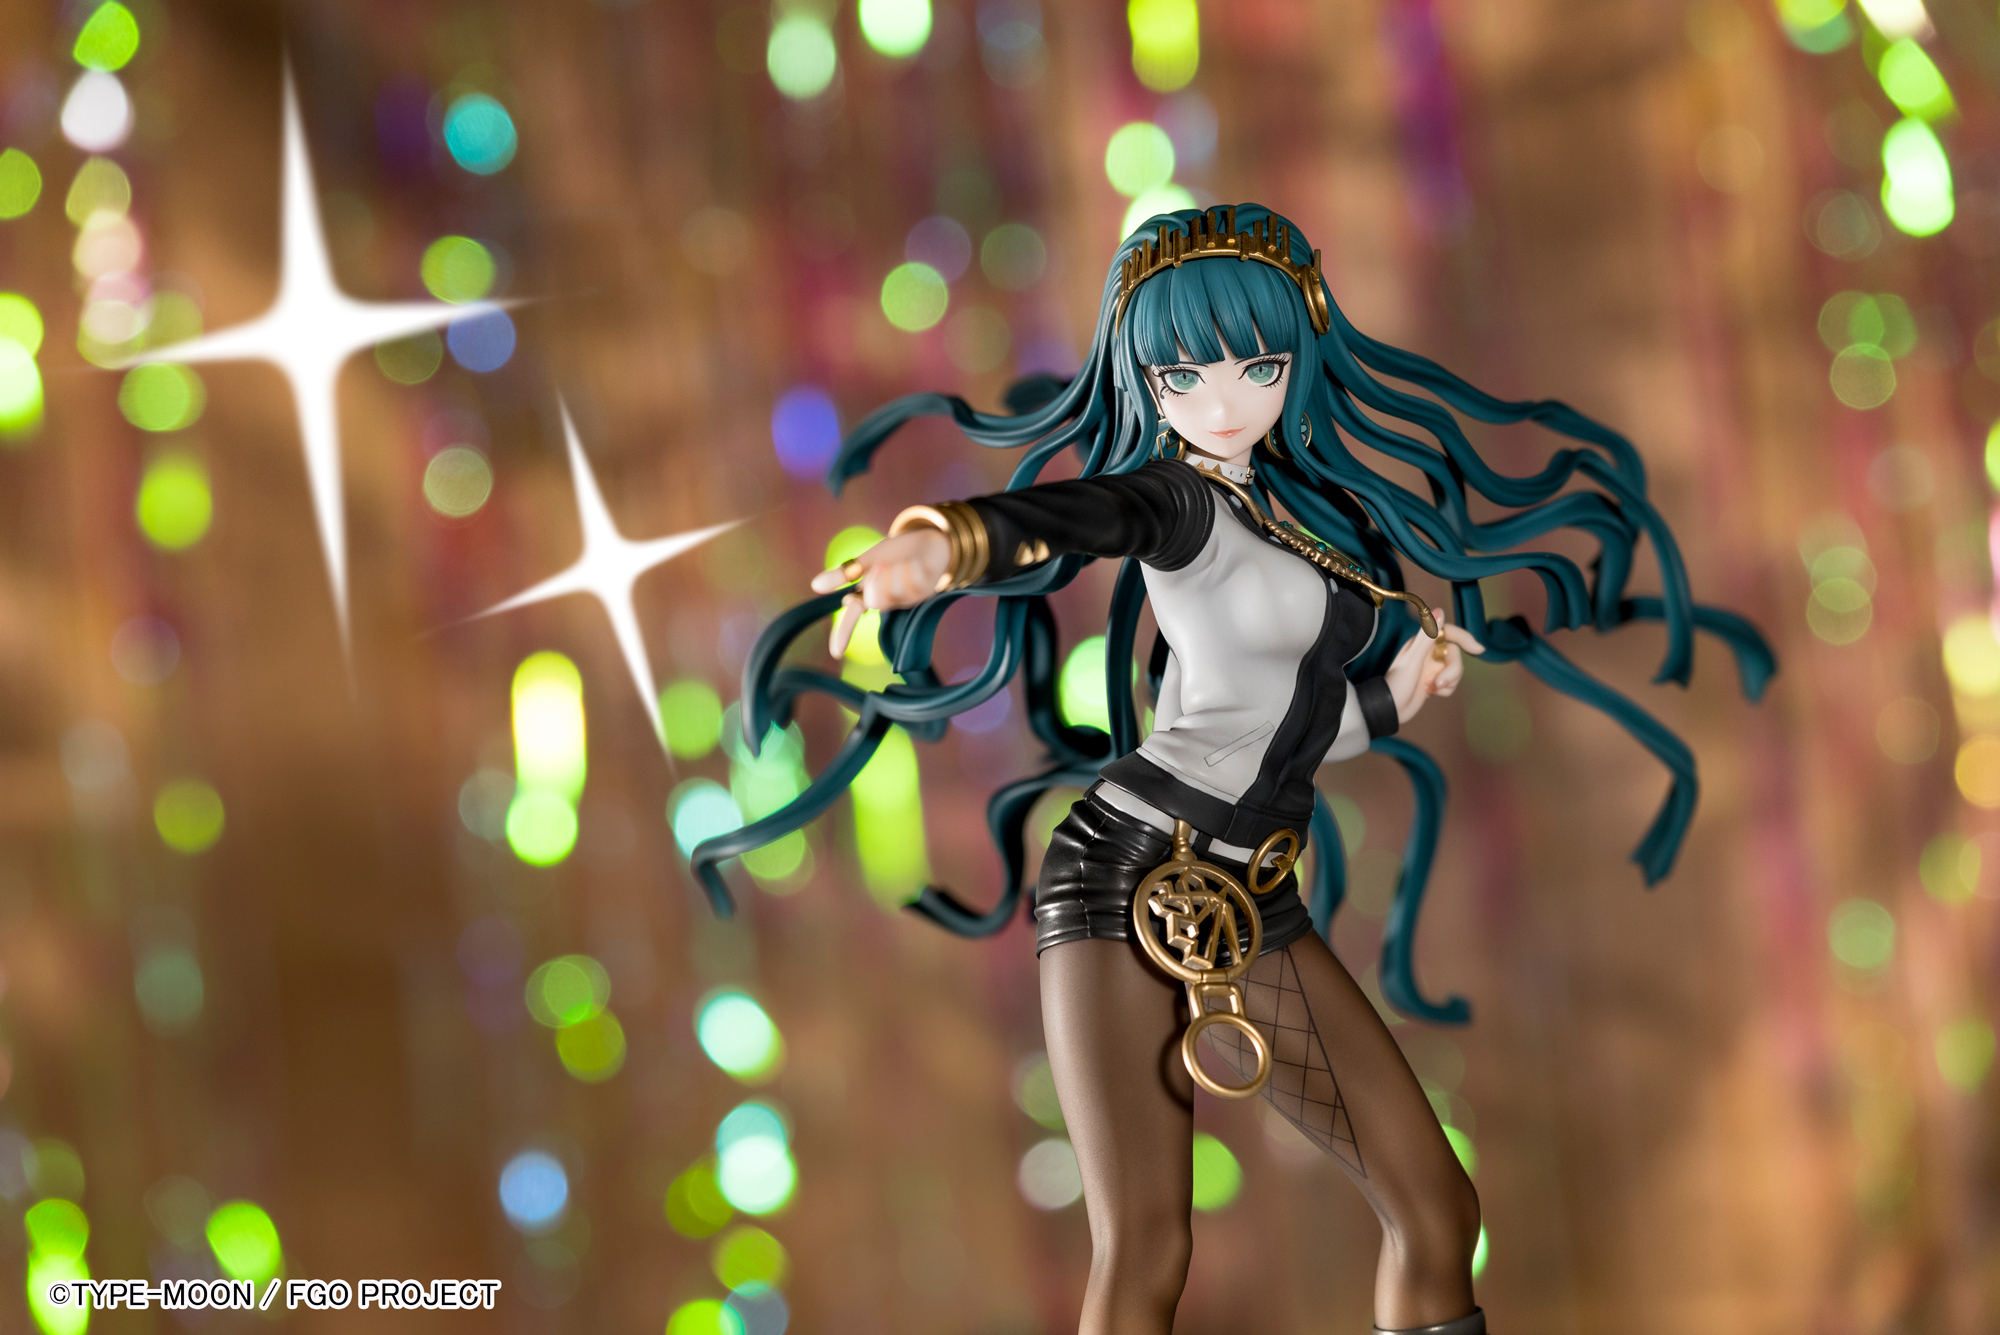 Fate/Grand Order Assassin/Cleopatra